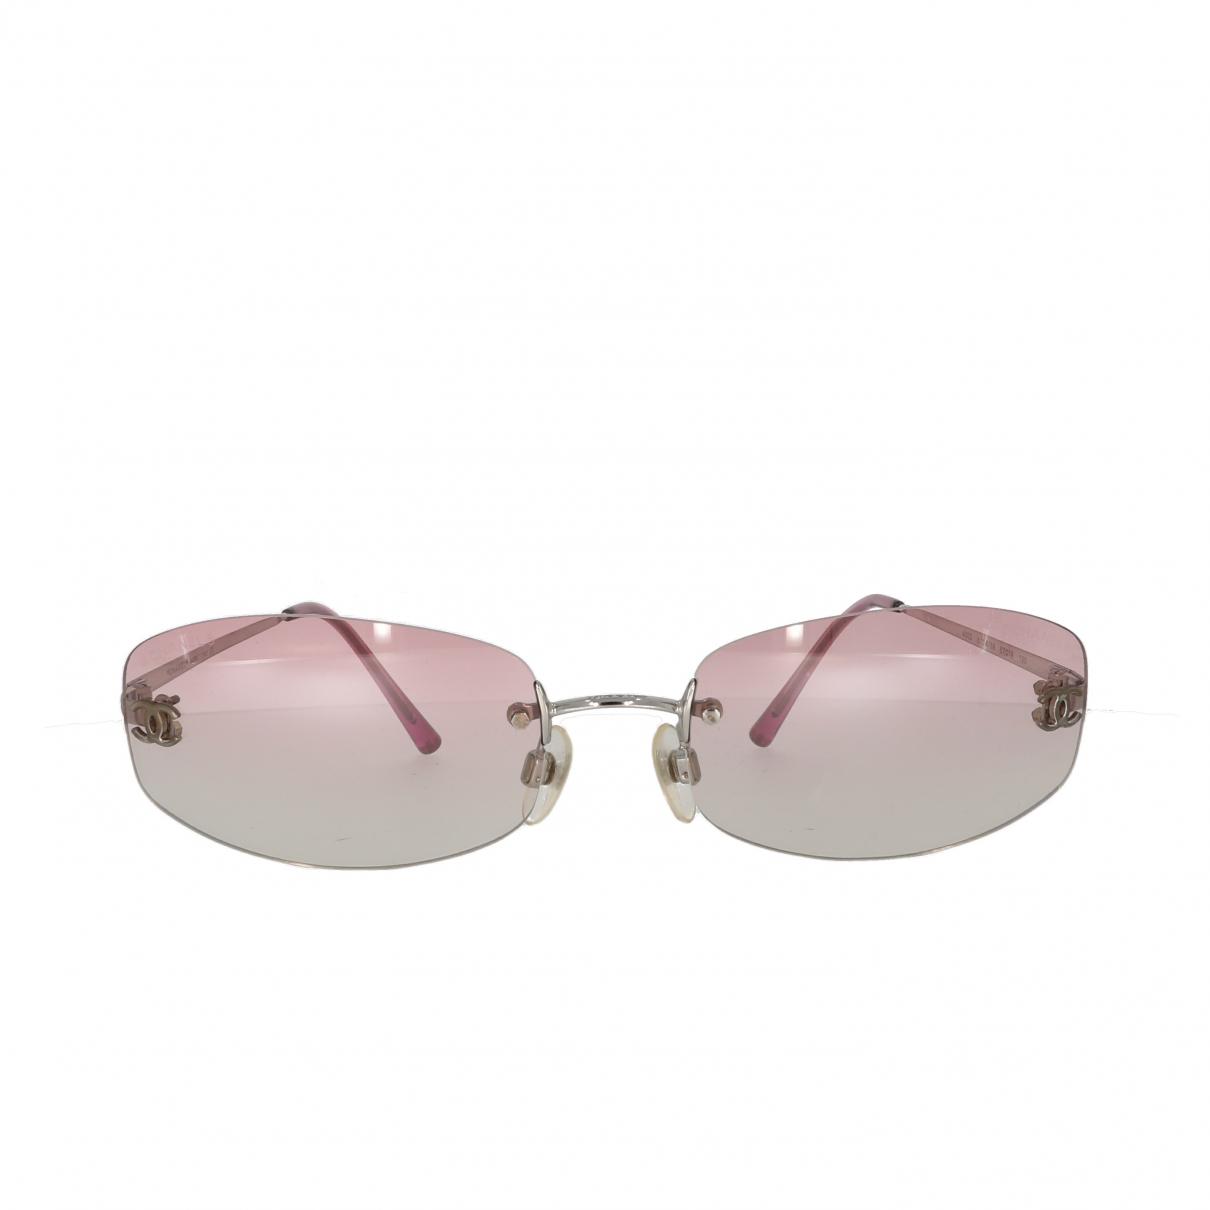 Chanel \N Pink Metal Sunglasses for Women \N